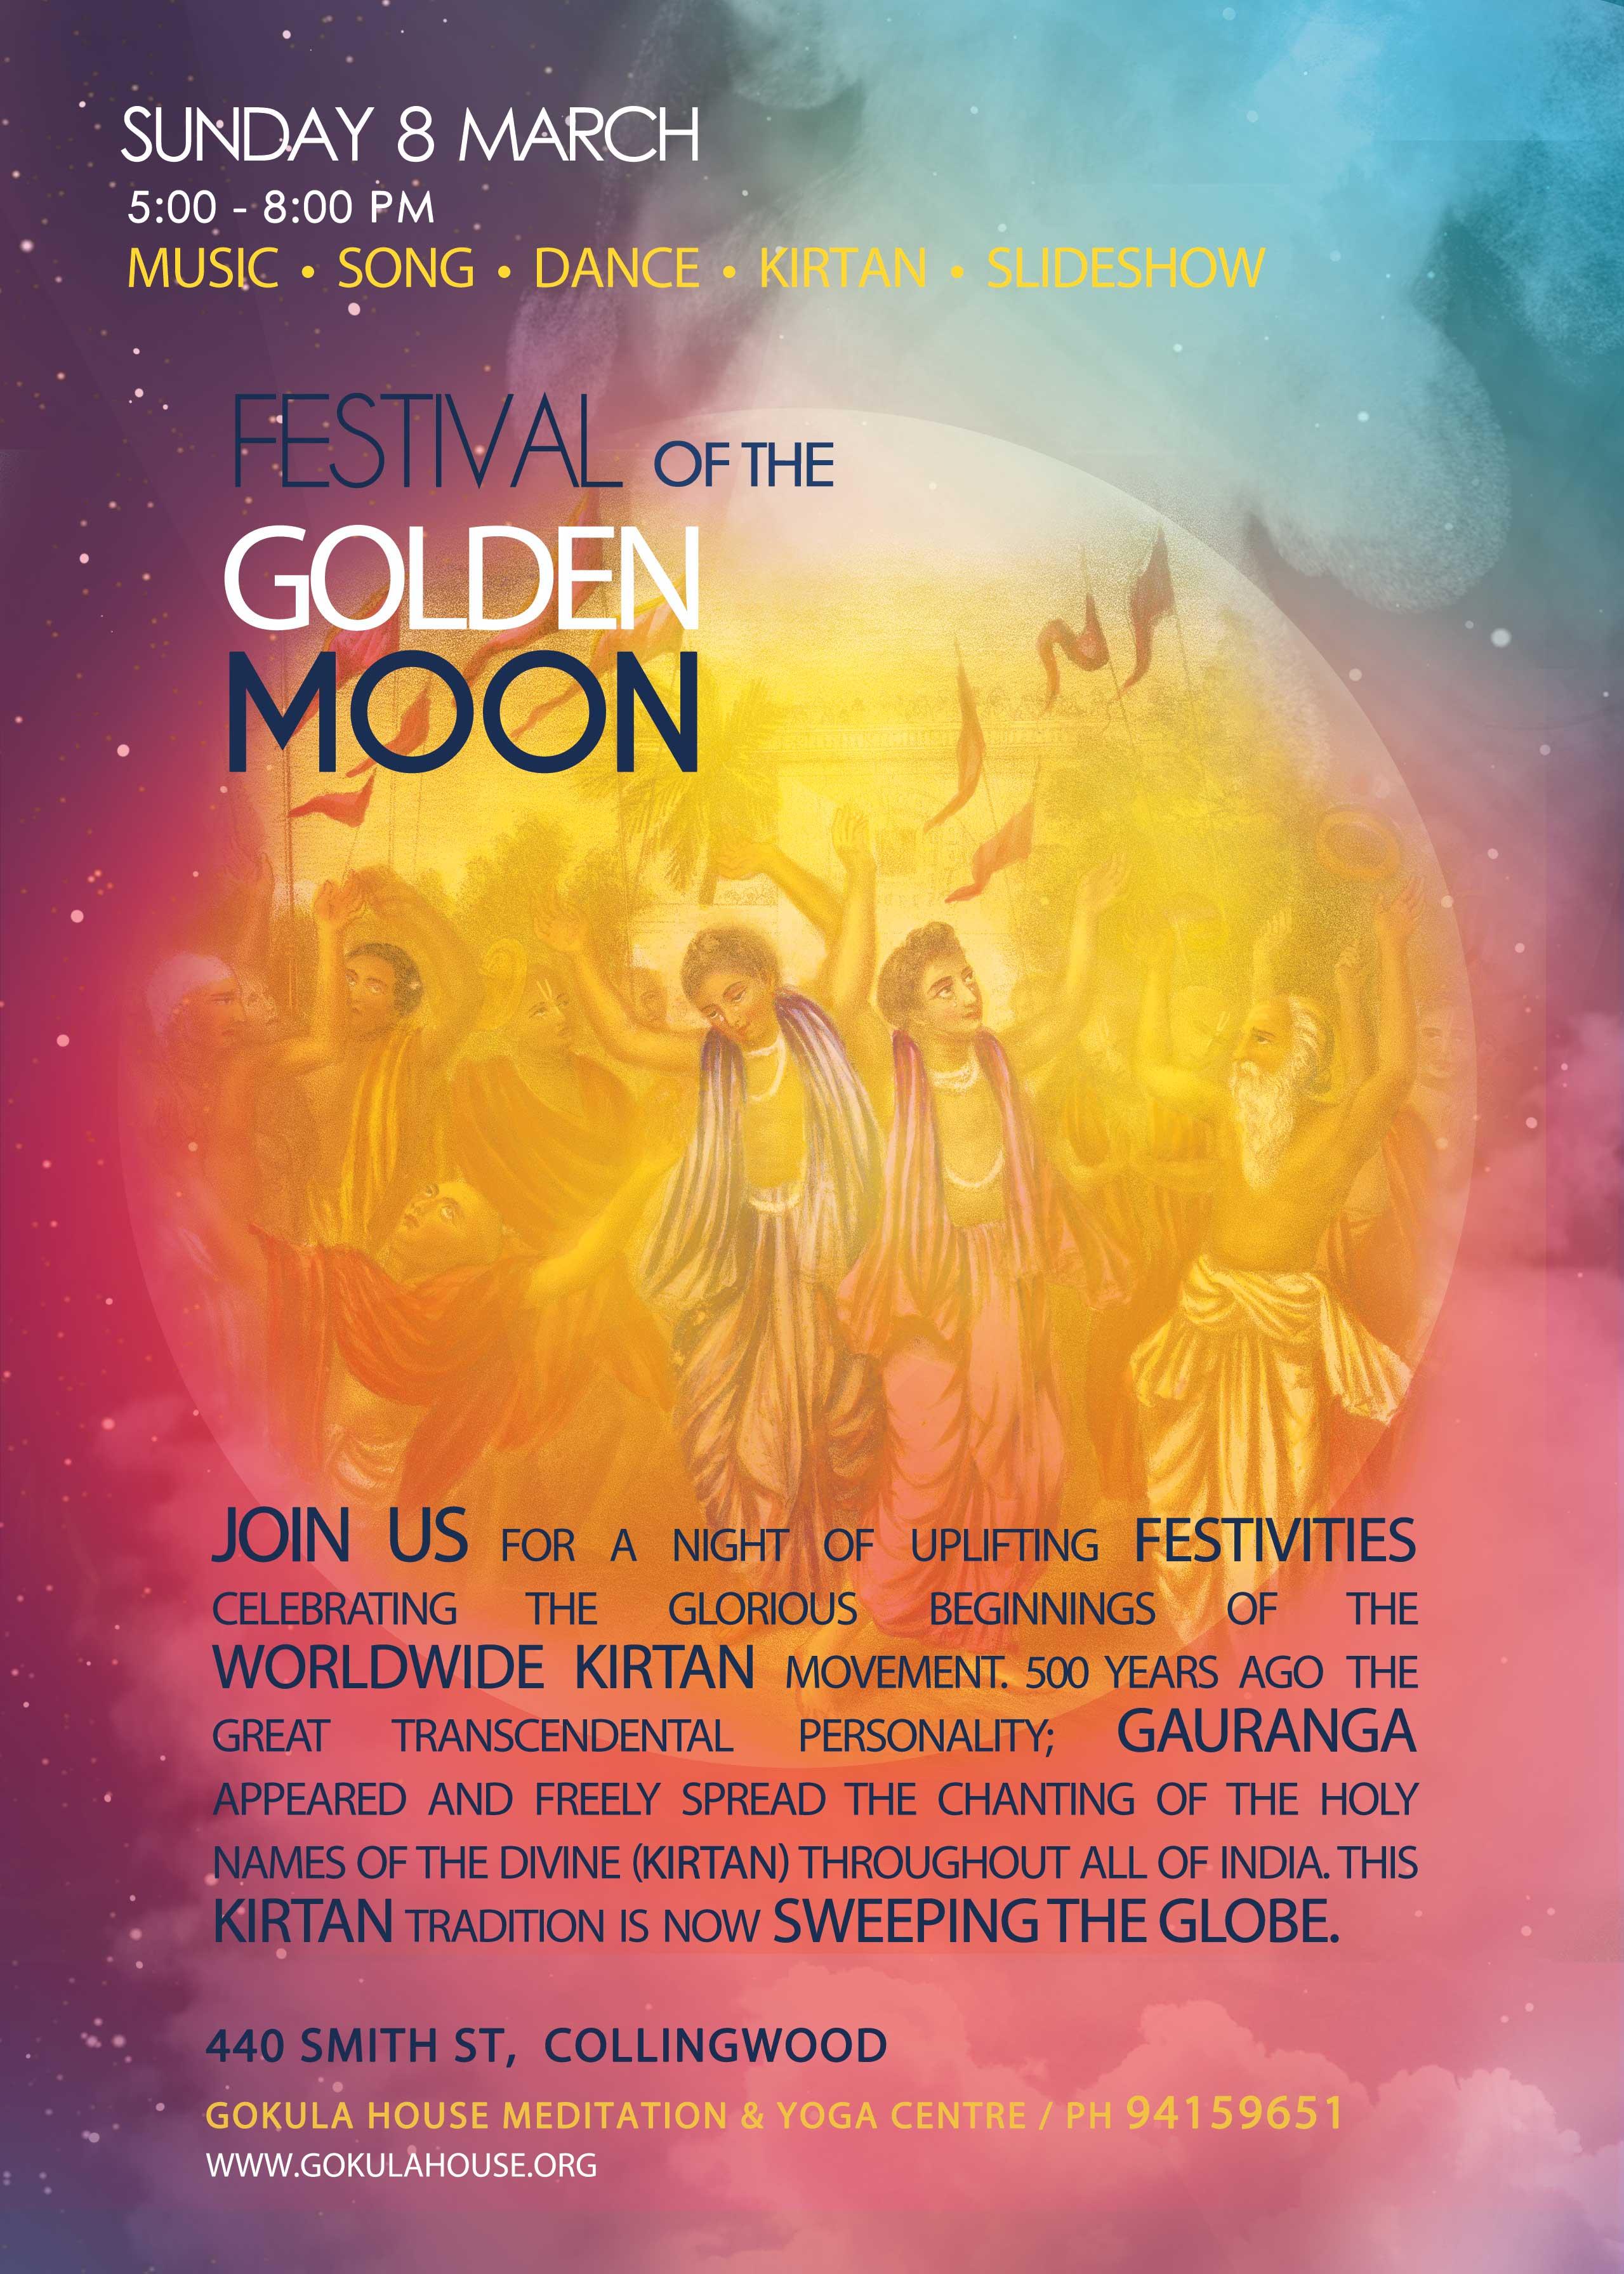 Festival of the Golden Moon